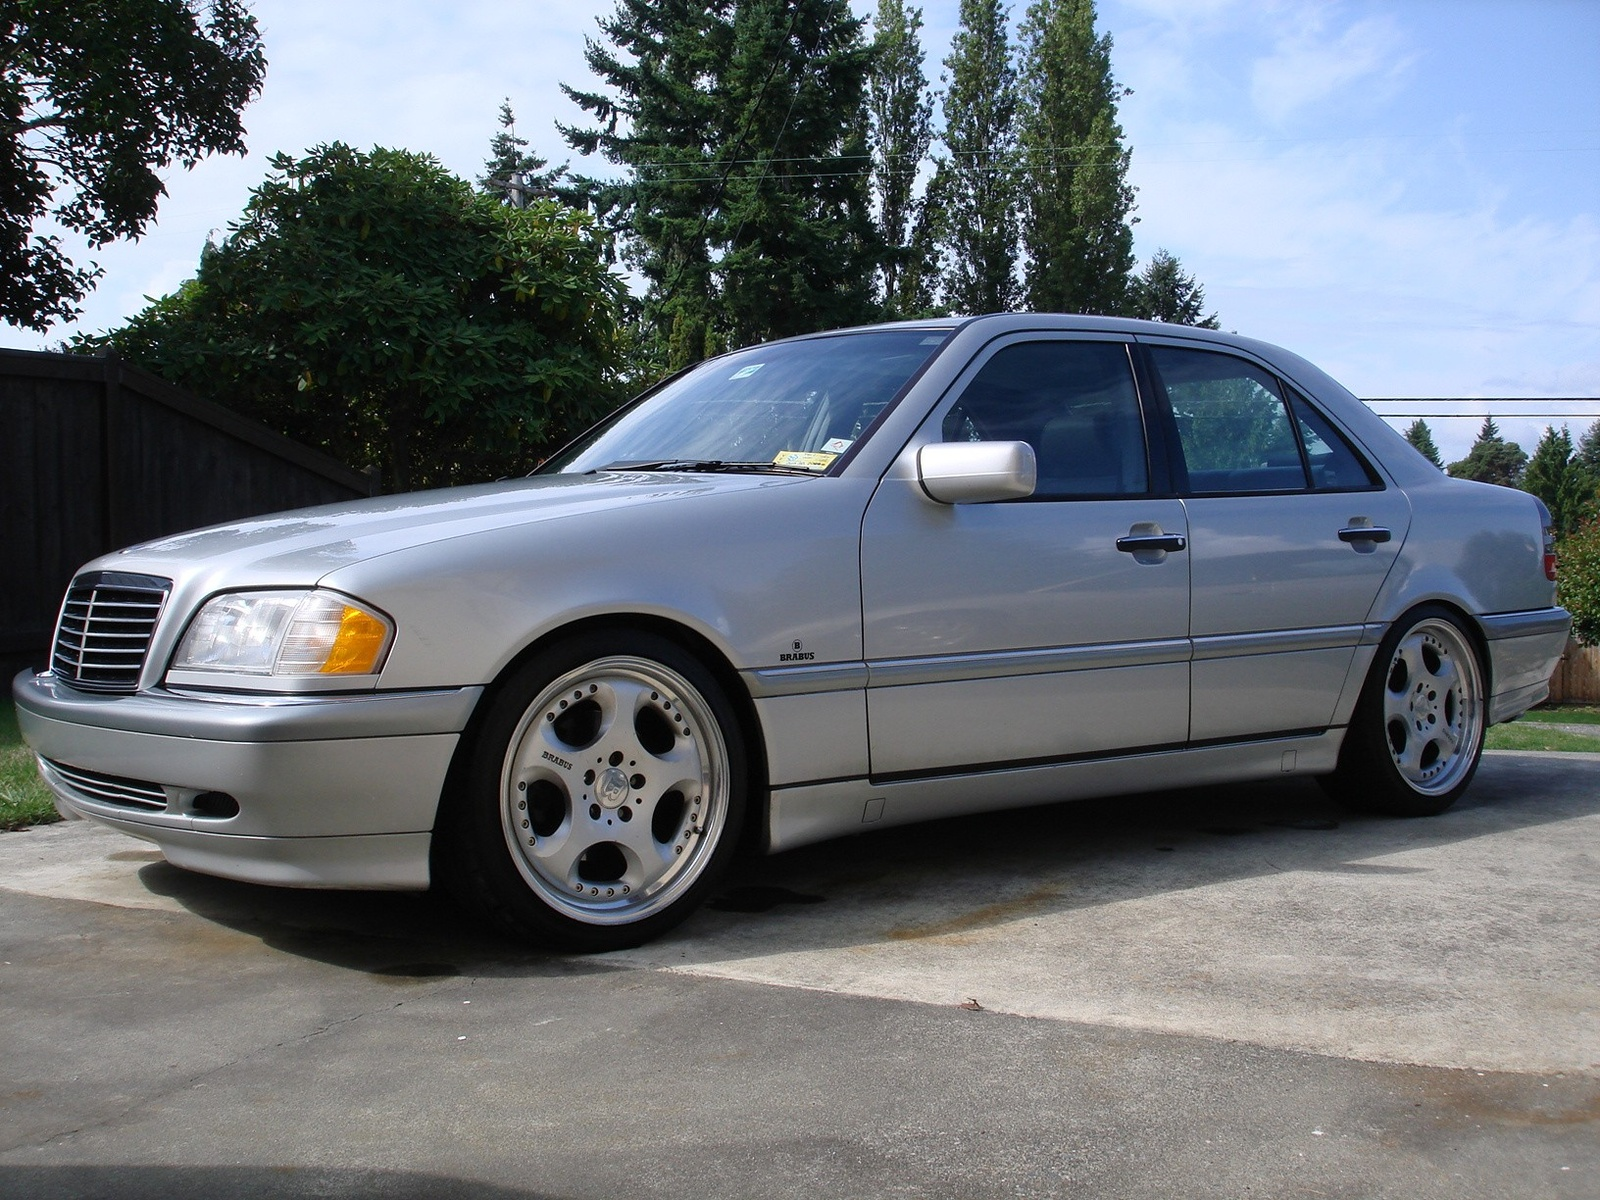 Mercedes benz c 280 photos reviews news specs buy car for Who buys mercedes benz